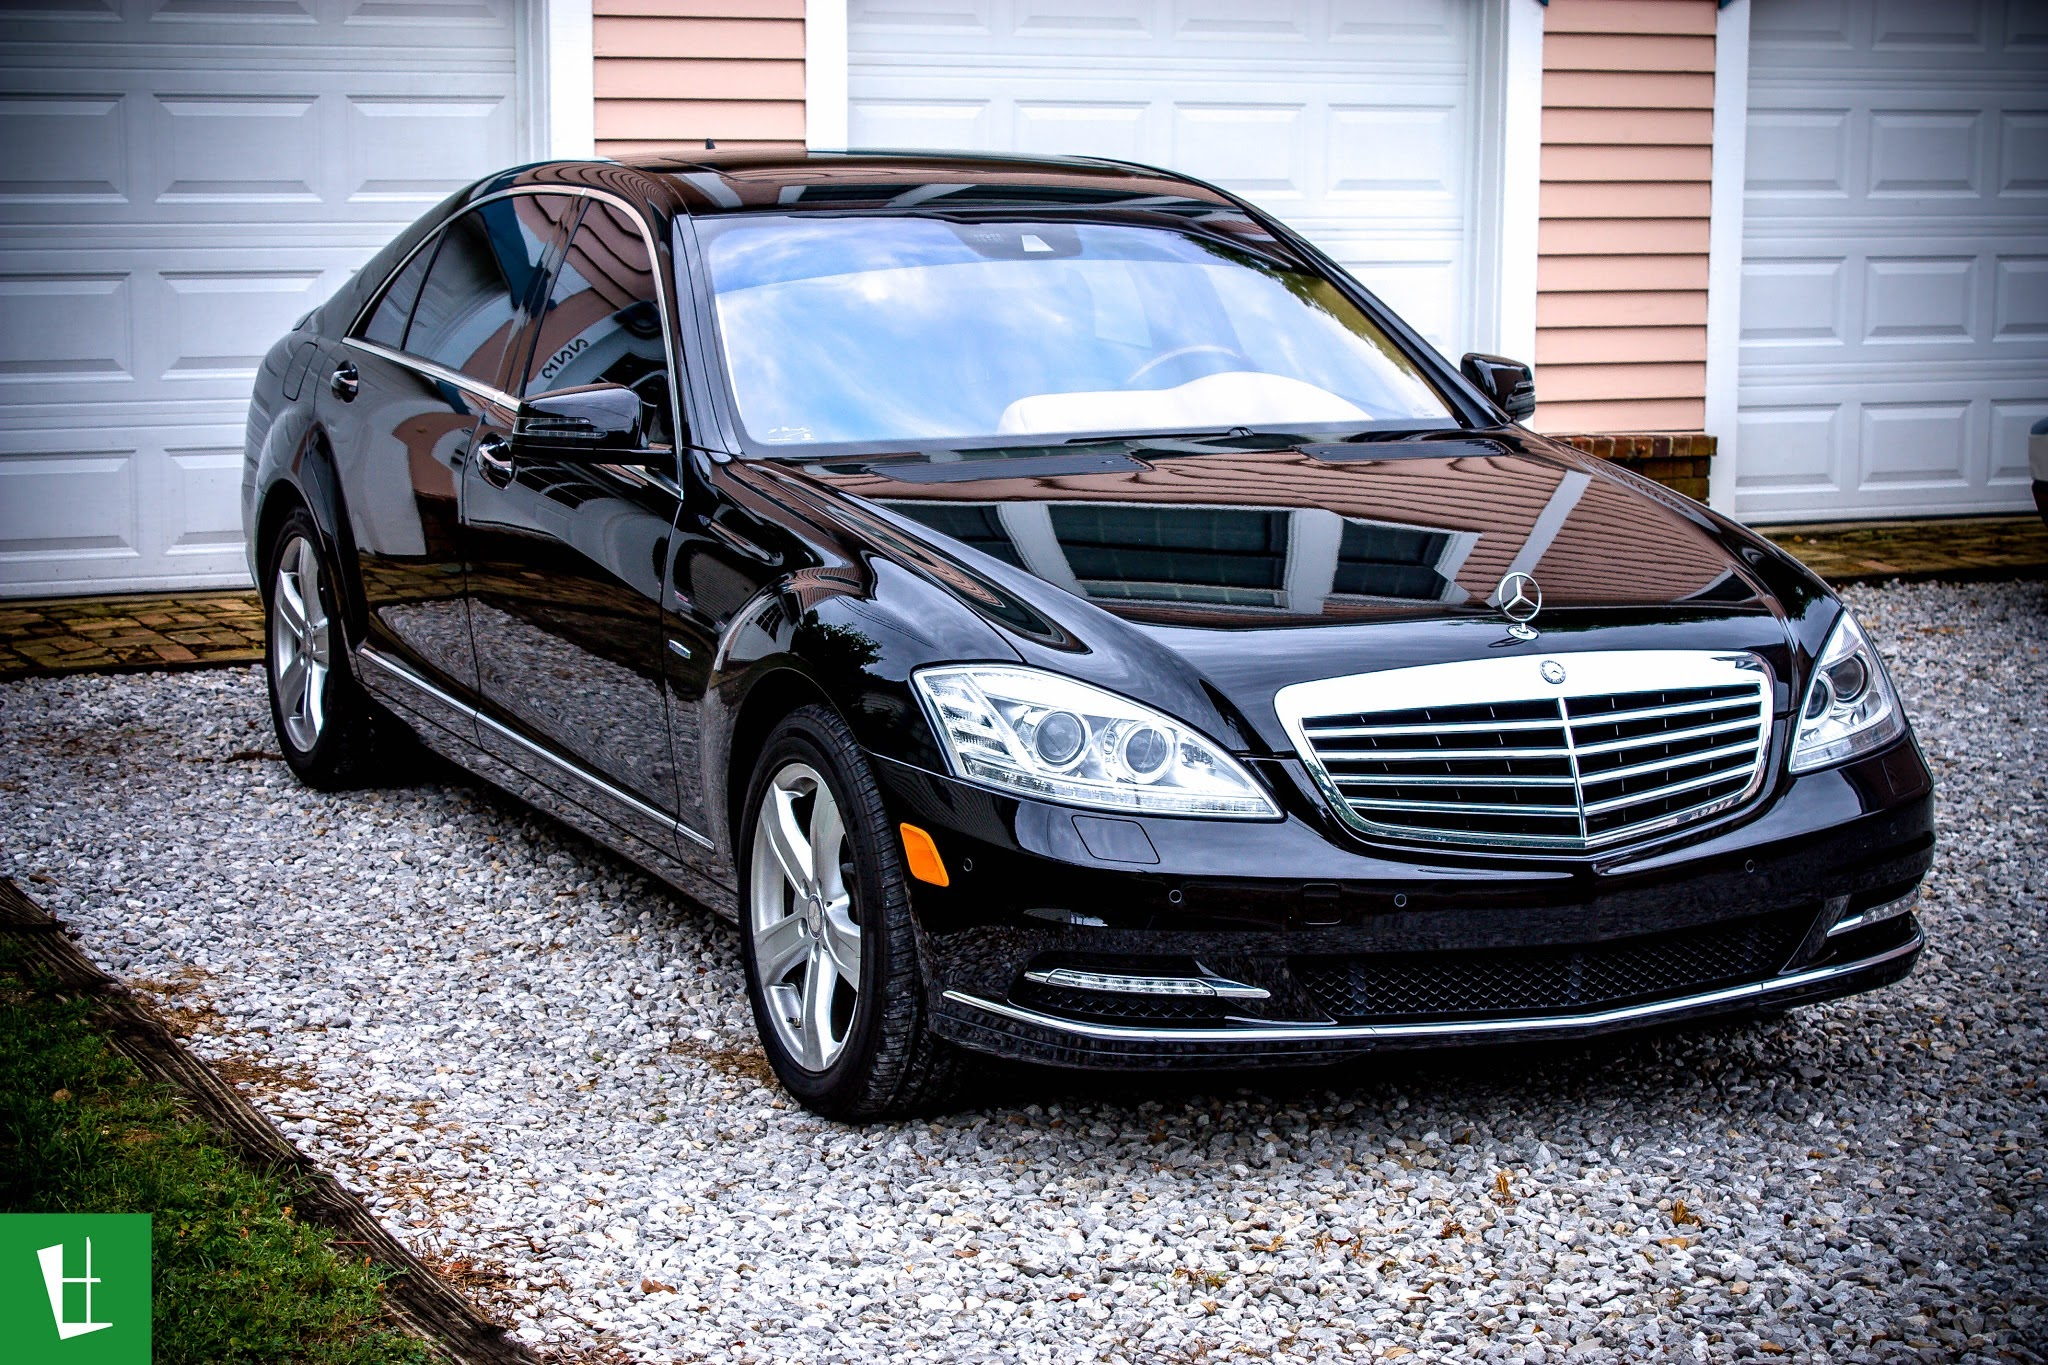 specs photos class reviews options s ca research mercedes benz price autotrader trims